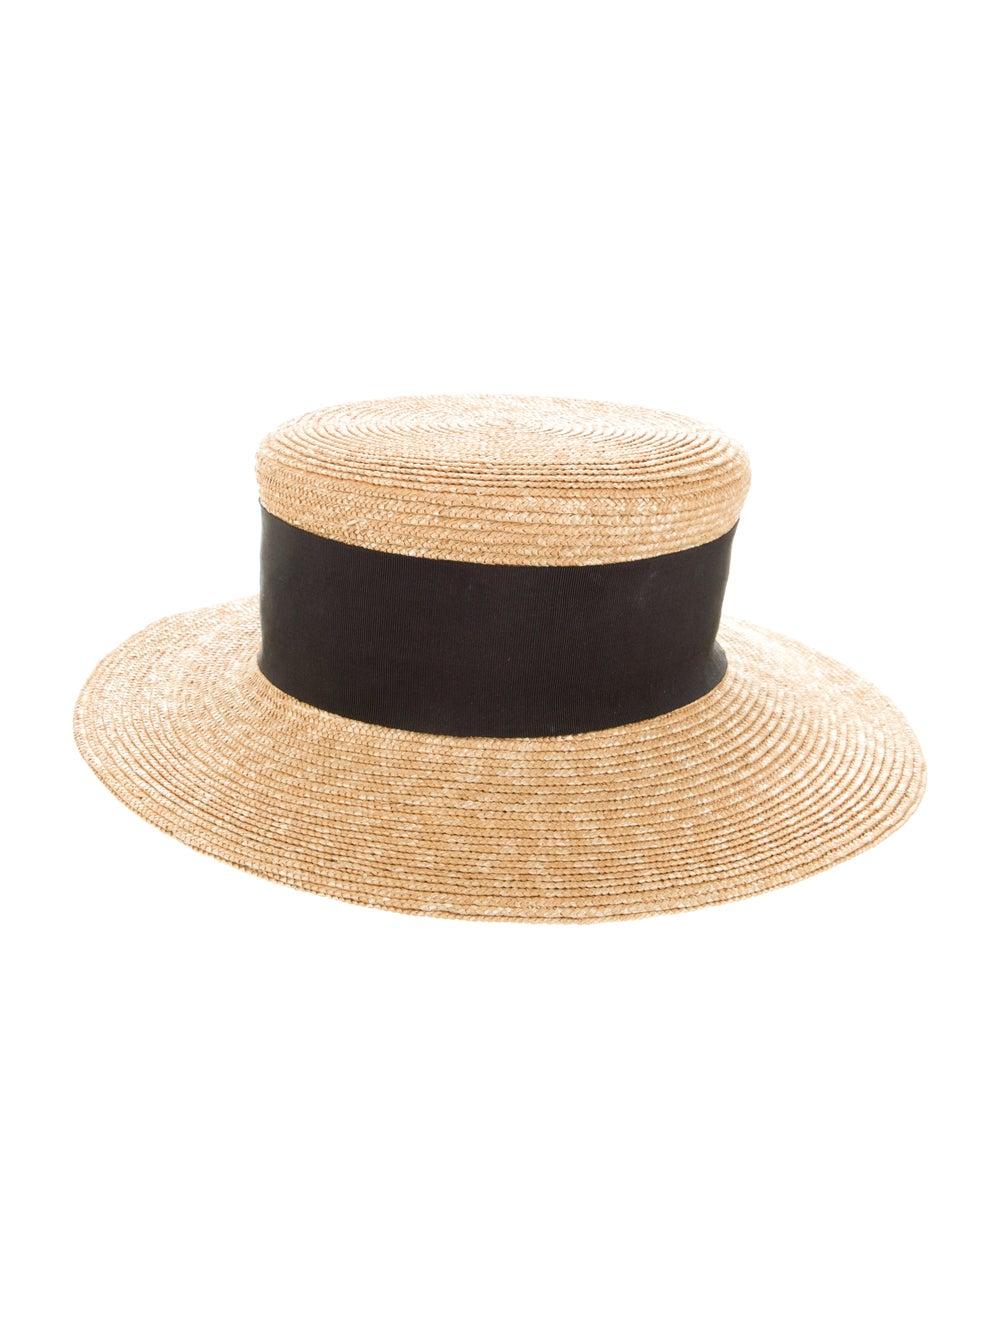 Patricia Underwood Raffia Wide Brim Fedora Hat Tan - image 2